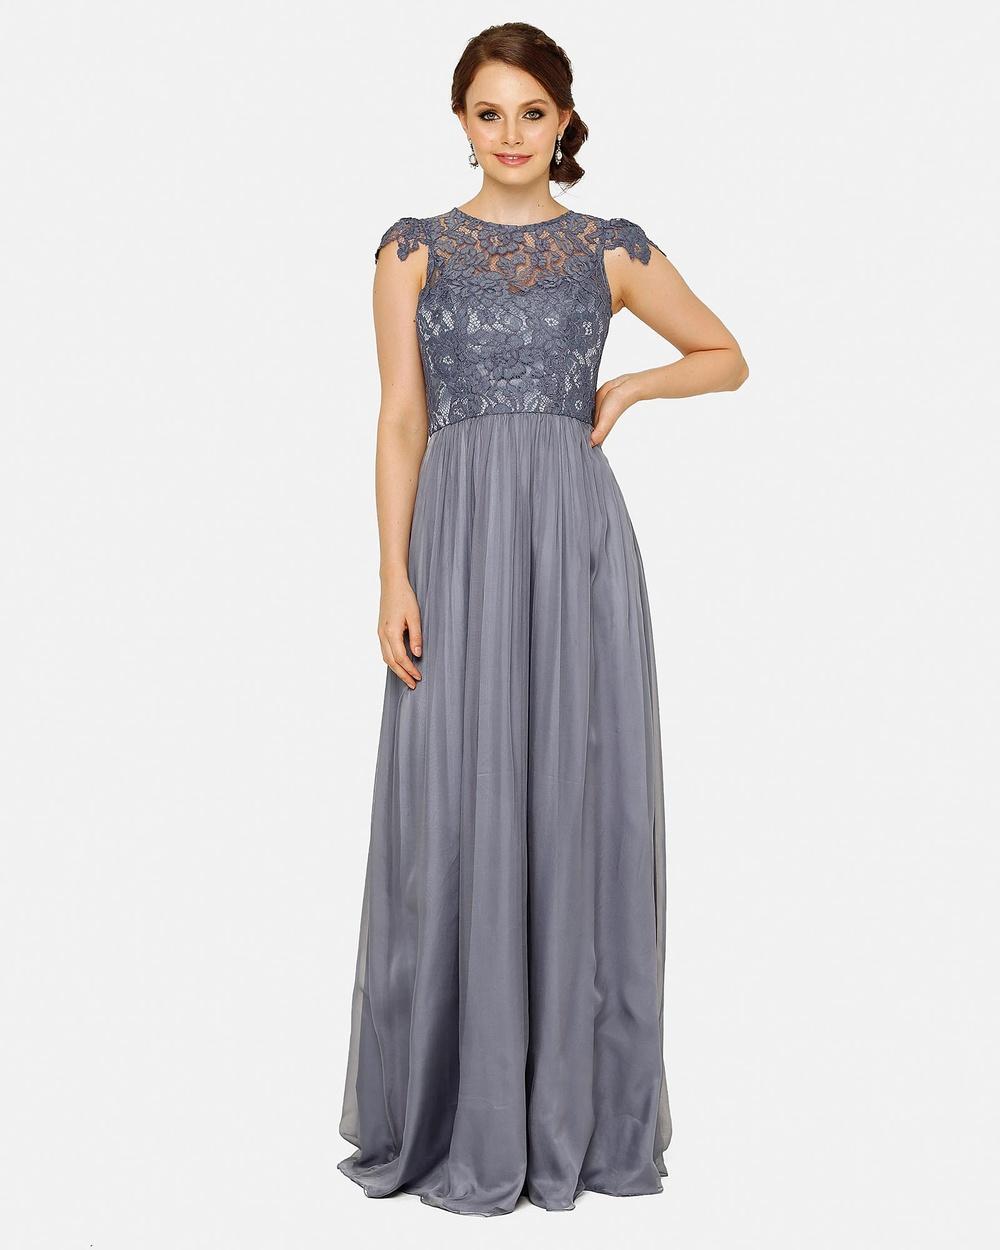 Tania Olsen Designs Latitia Dress Bridesmaid Dresses Dusty blue Latitia Dress